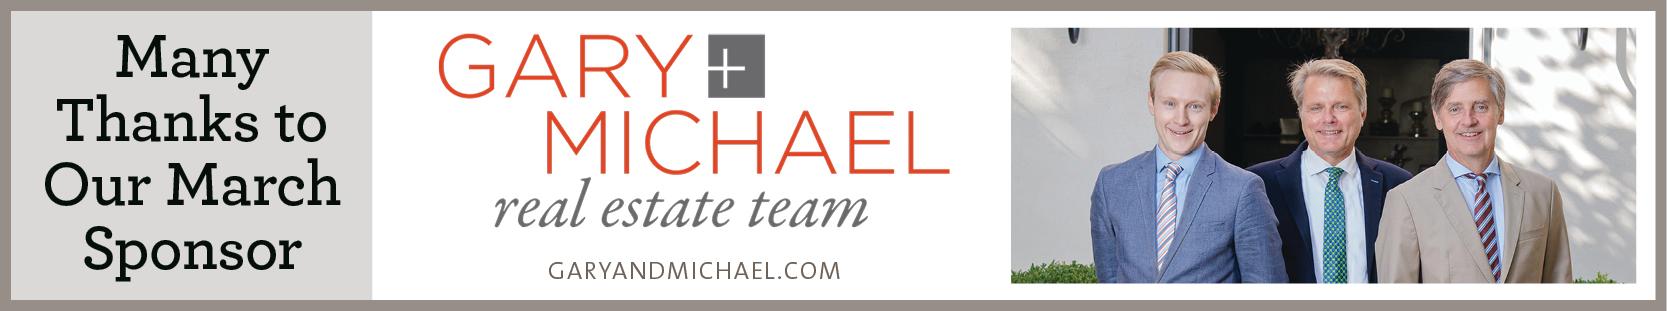 CHV_Gary&Michael_banner_600x112_Mar21